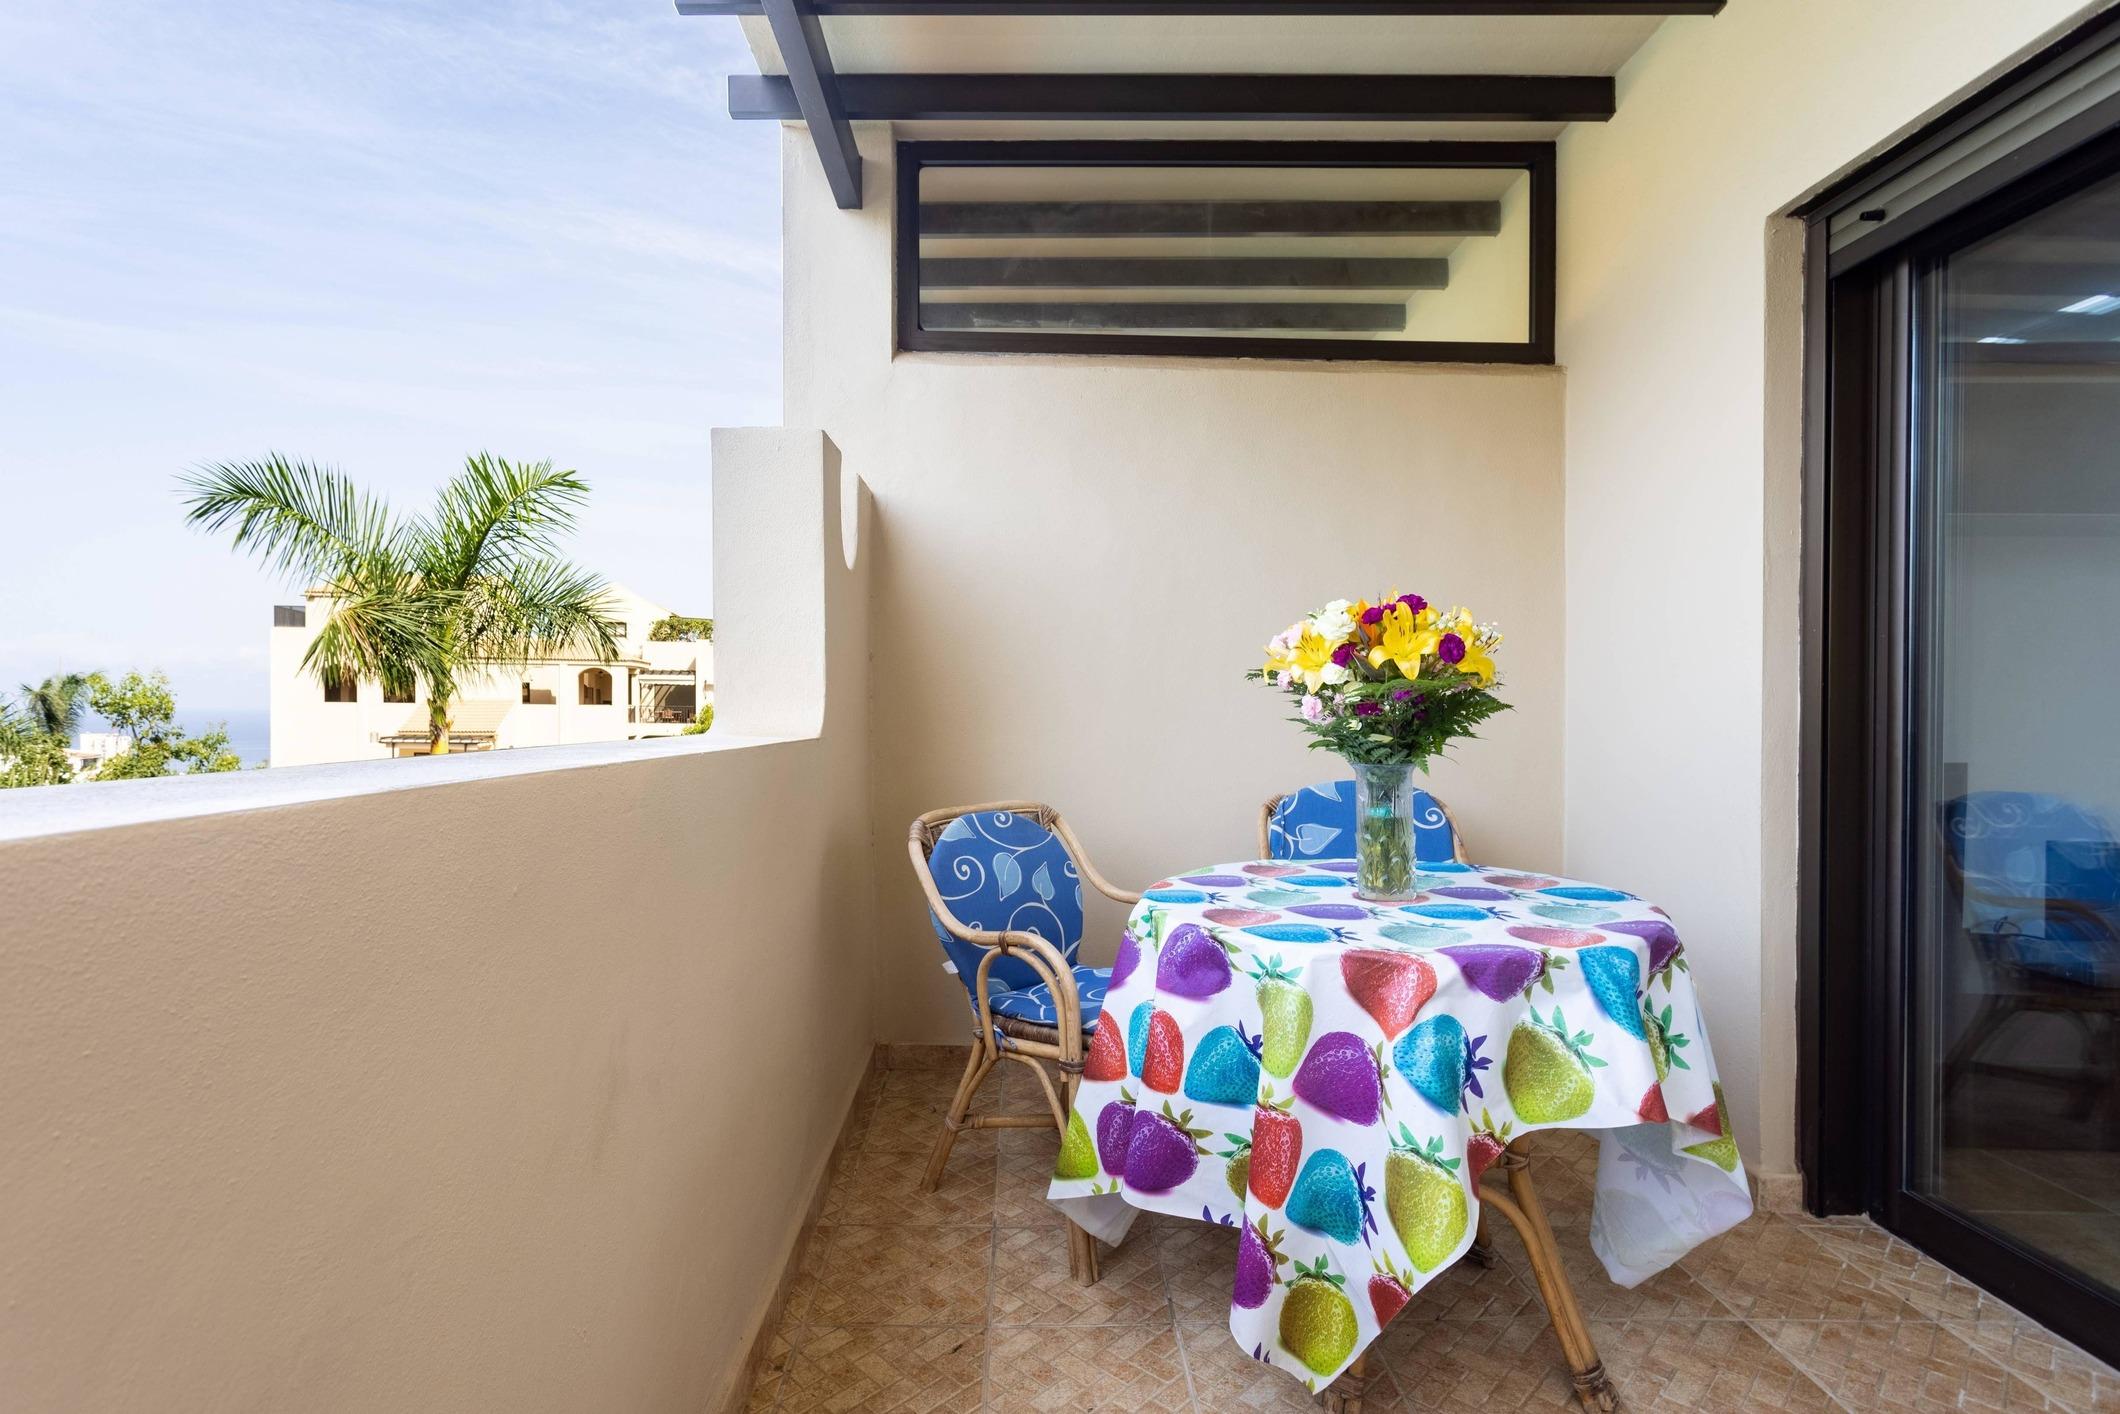 Appartement de vacances Fewo Mar y Teide Romantico, grosszügig, mit 2 Terrassen, Pool, Parkplatz,  Sicht auf Meer  (2492990), Puerto de la Cruz, Ténérife, Iles Canaries, Espagne, image 7